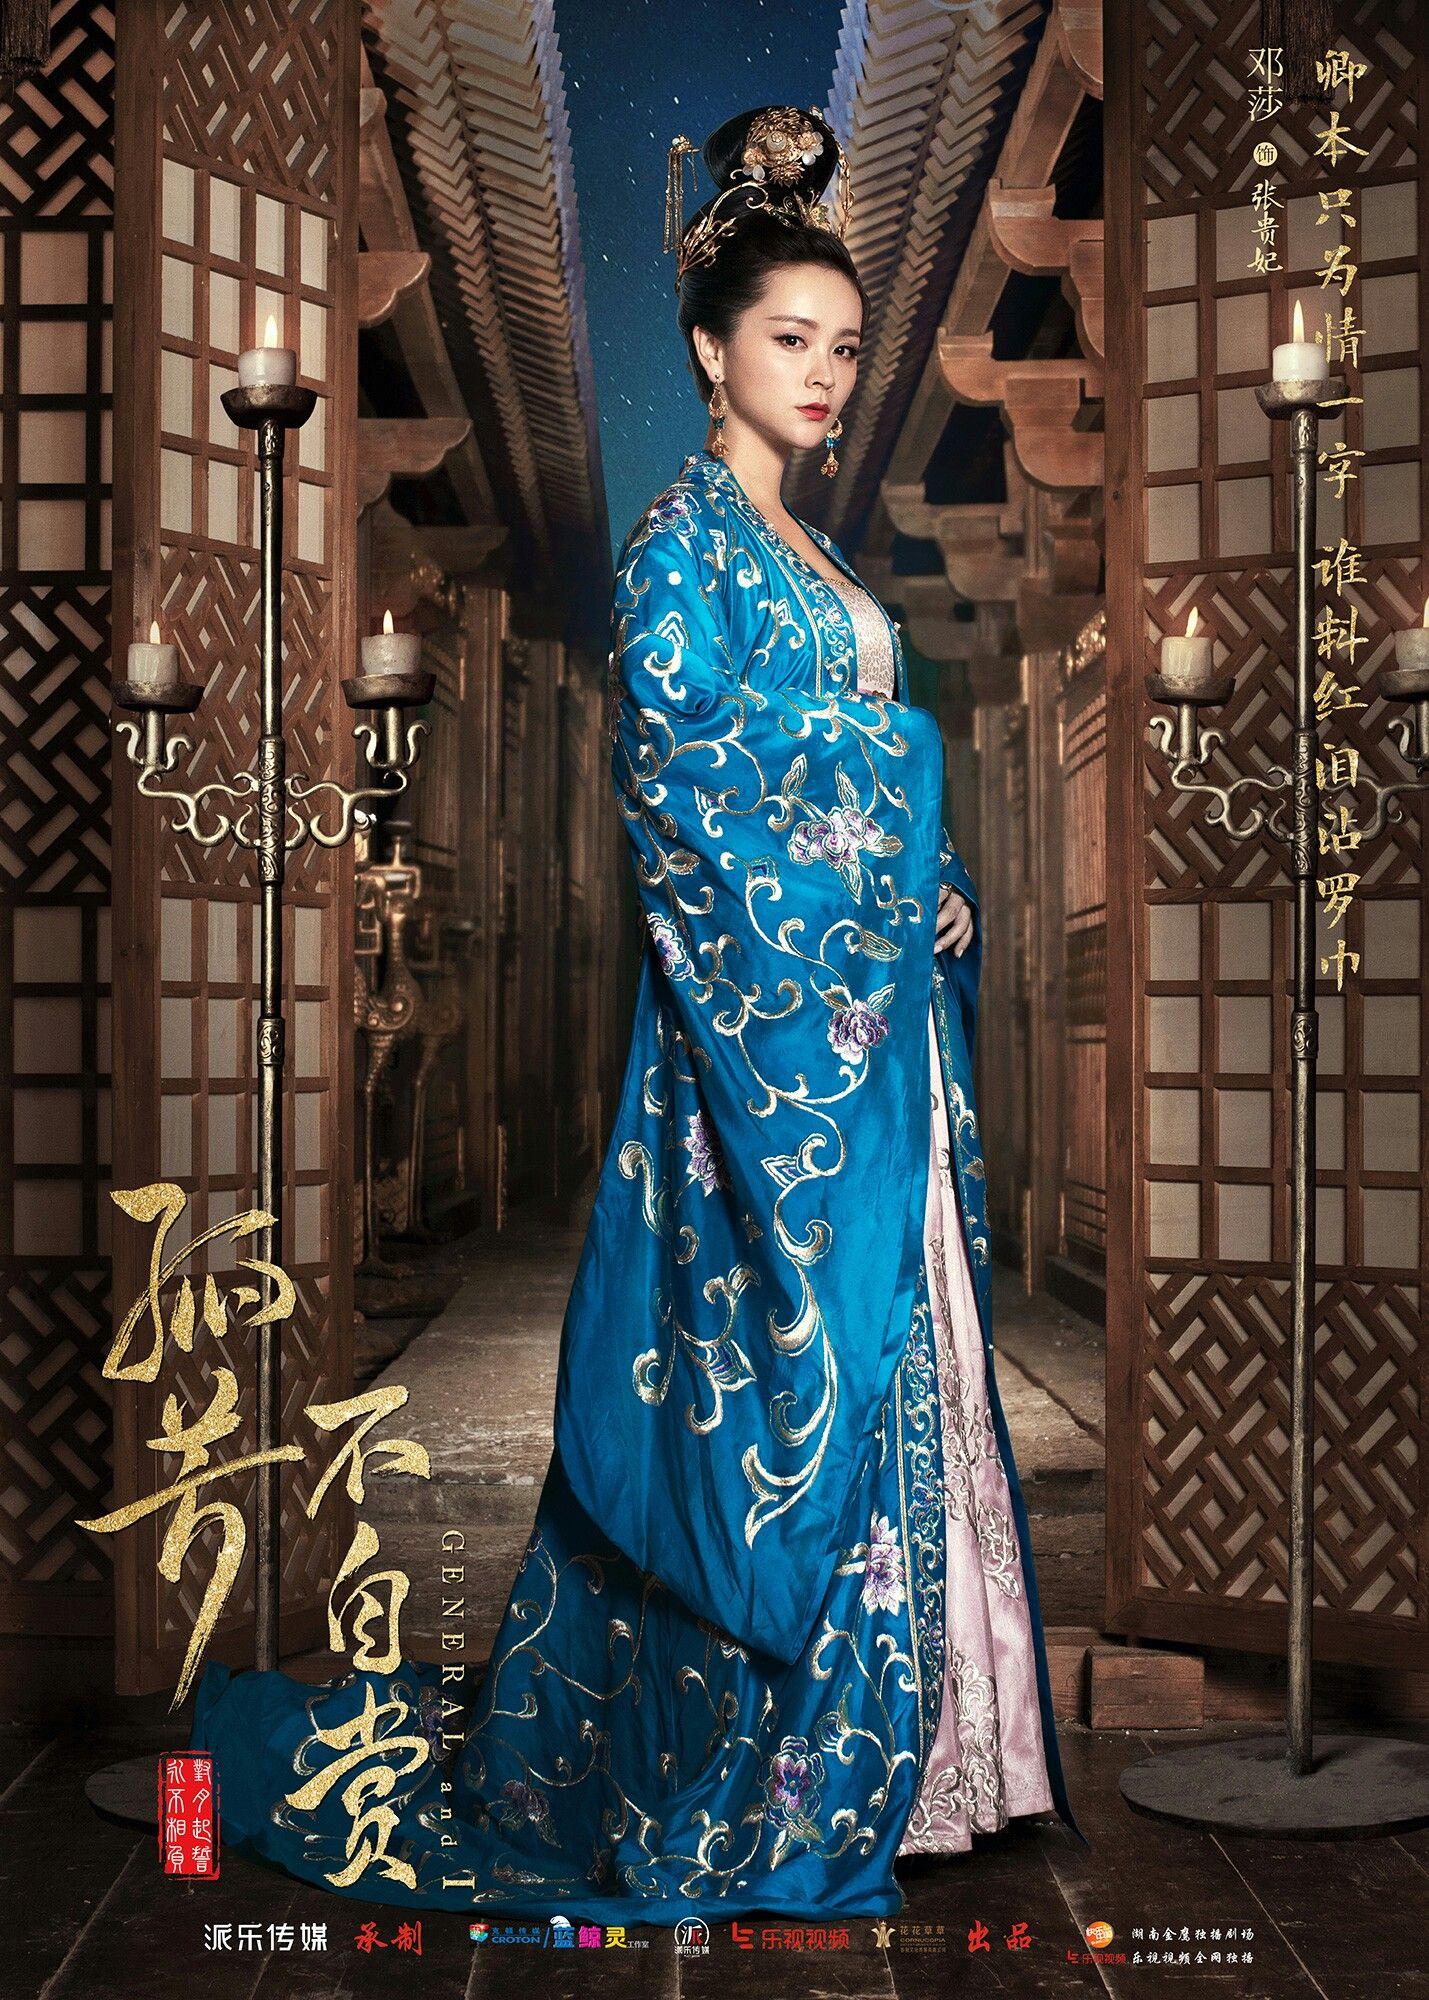 General and I 《孤芳不自赏》 - Angelababy, Wallace Chung, Sun Yizhou ...